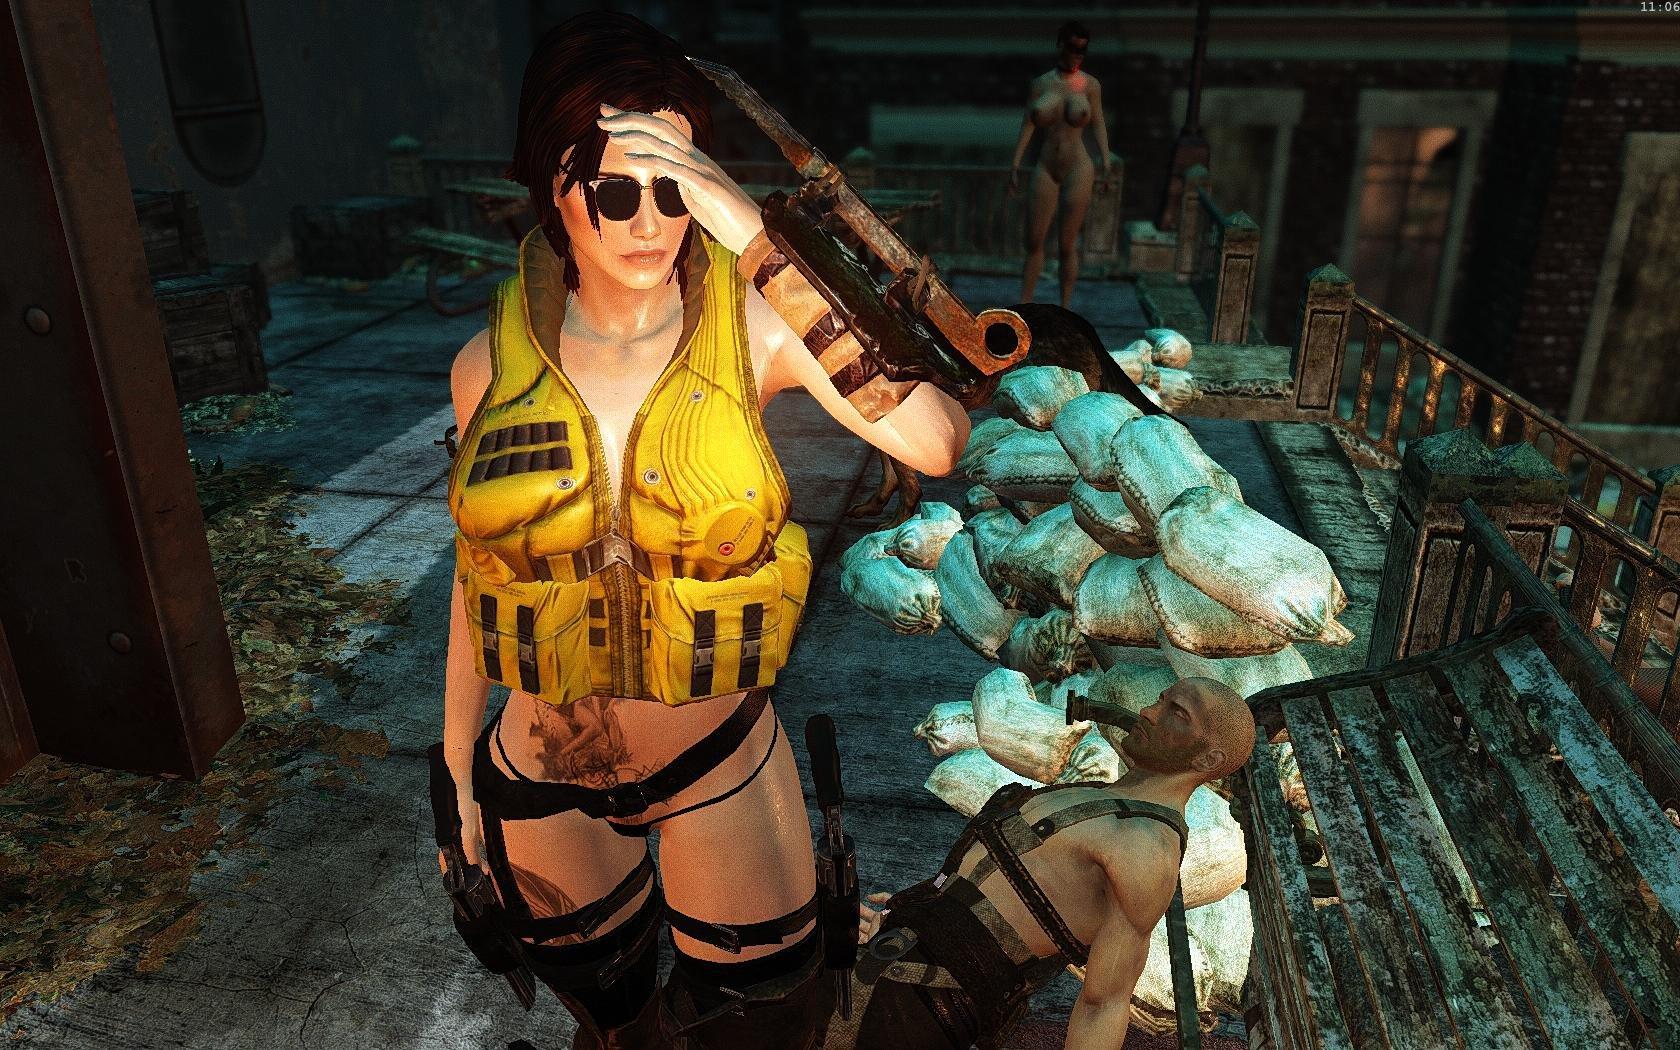 Fallout4 2019-03-25 11-06-46-41